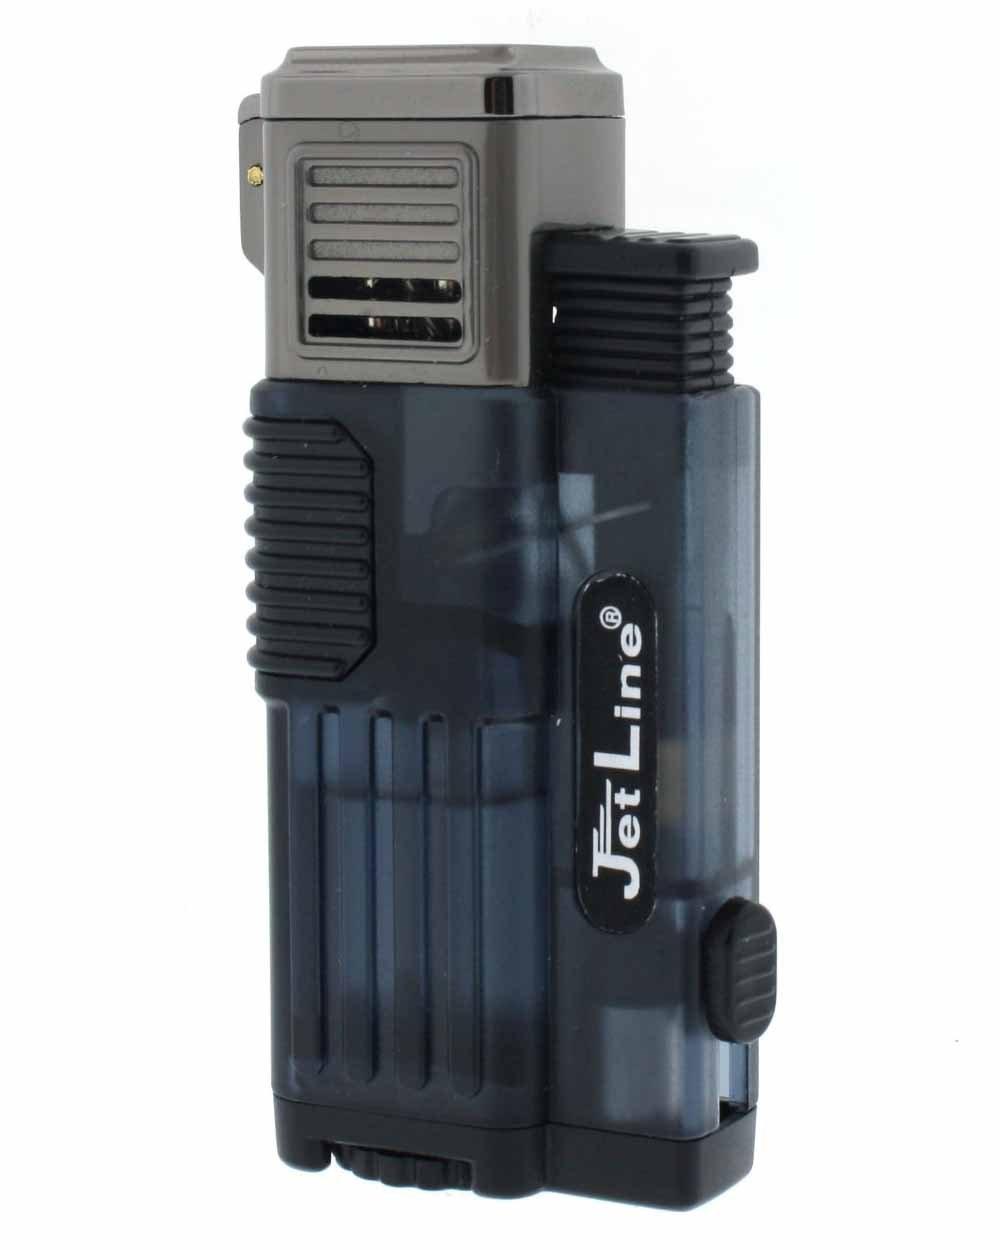 Amazon.com: JetLine Gotham Lite Quad Torch Flame Cigar Lighter Warranty Blue: Health & Personal Care